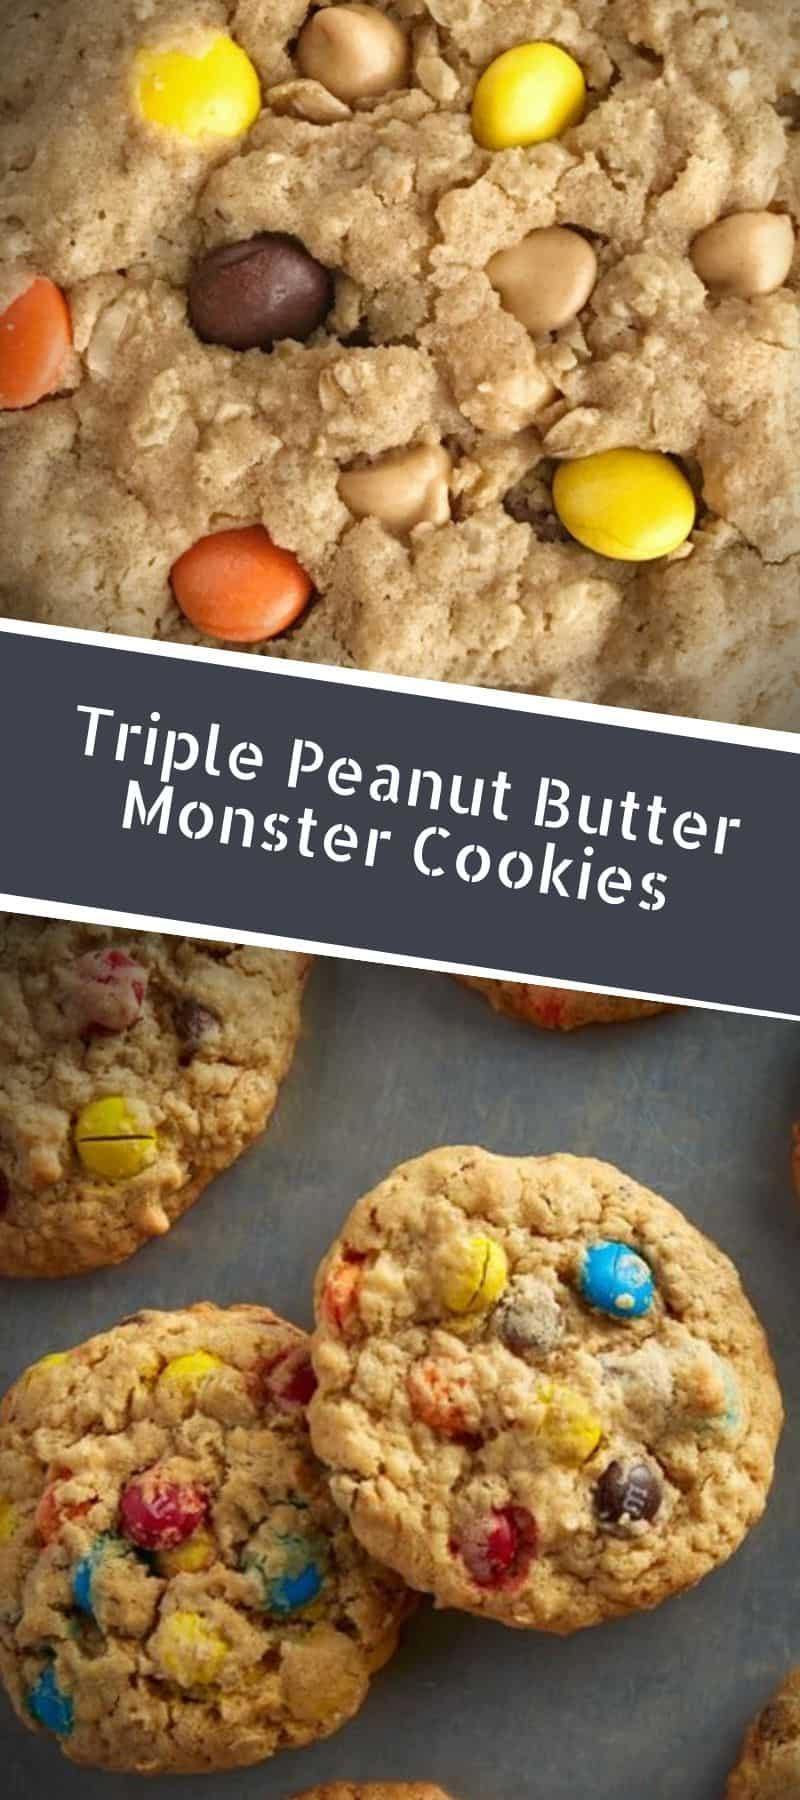 Triple Peanut Butter Monster Cookies Recipe 3